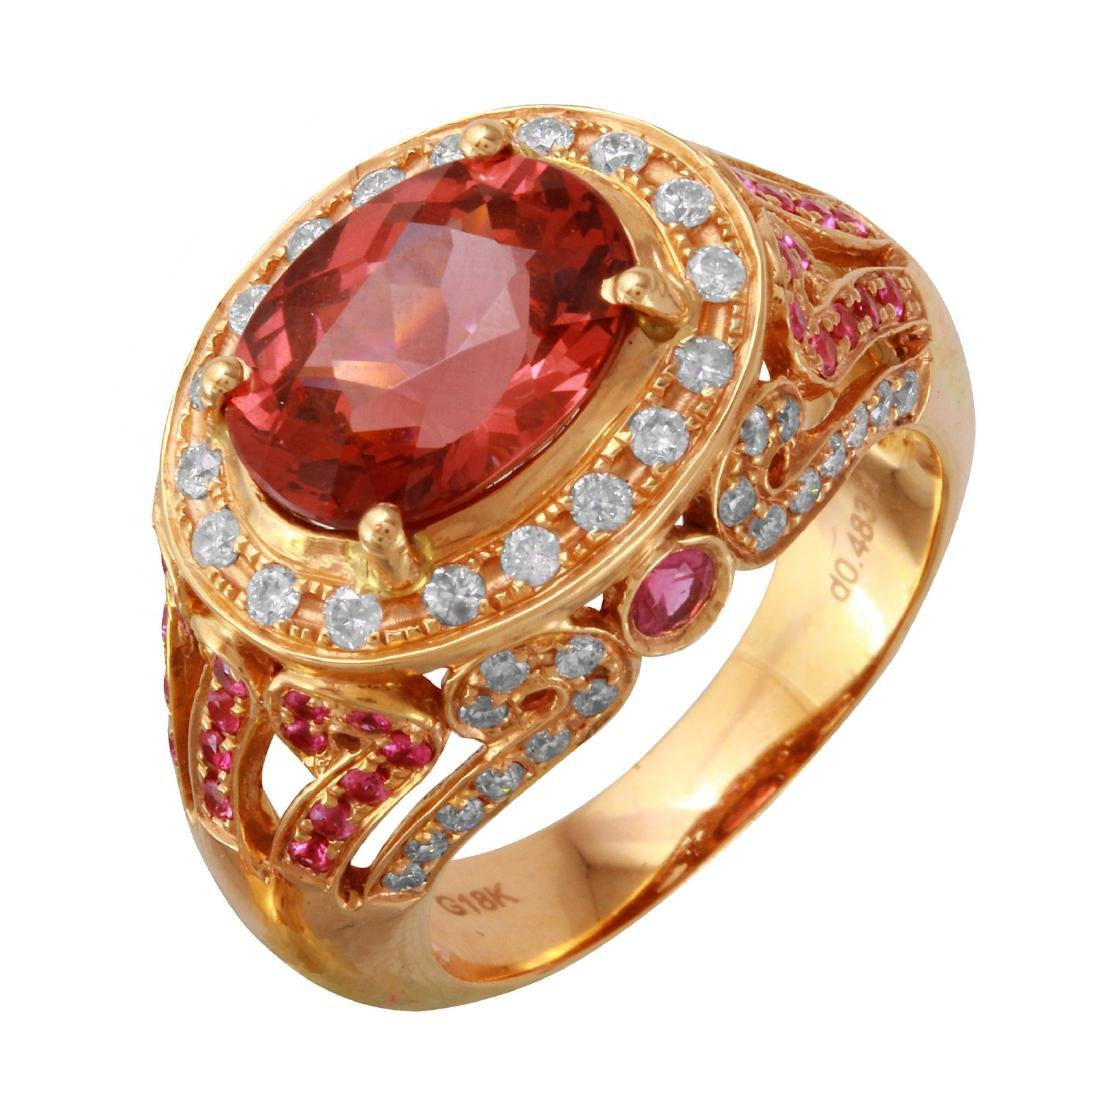 18KT Rose Gold Gemstone Ring